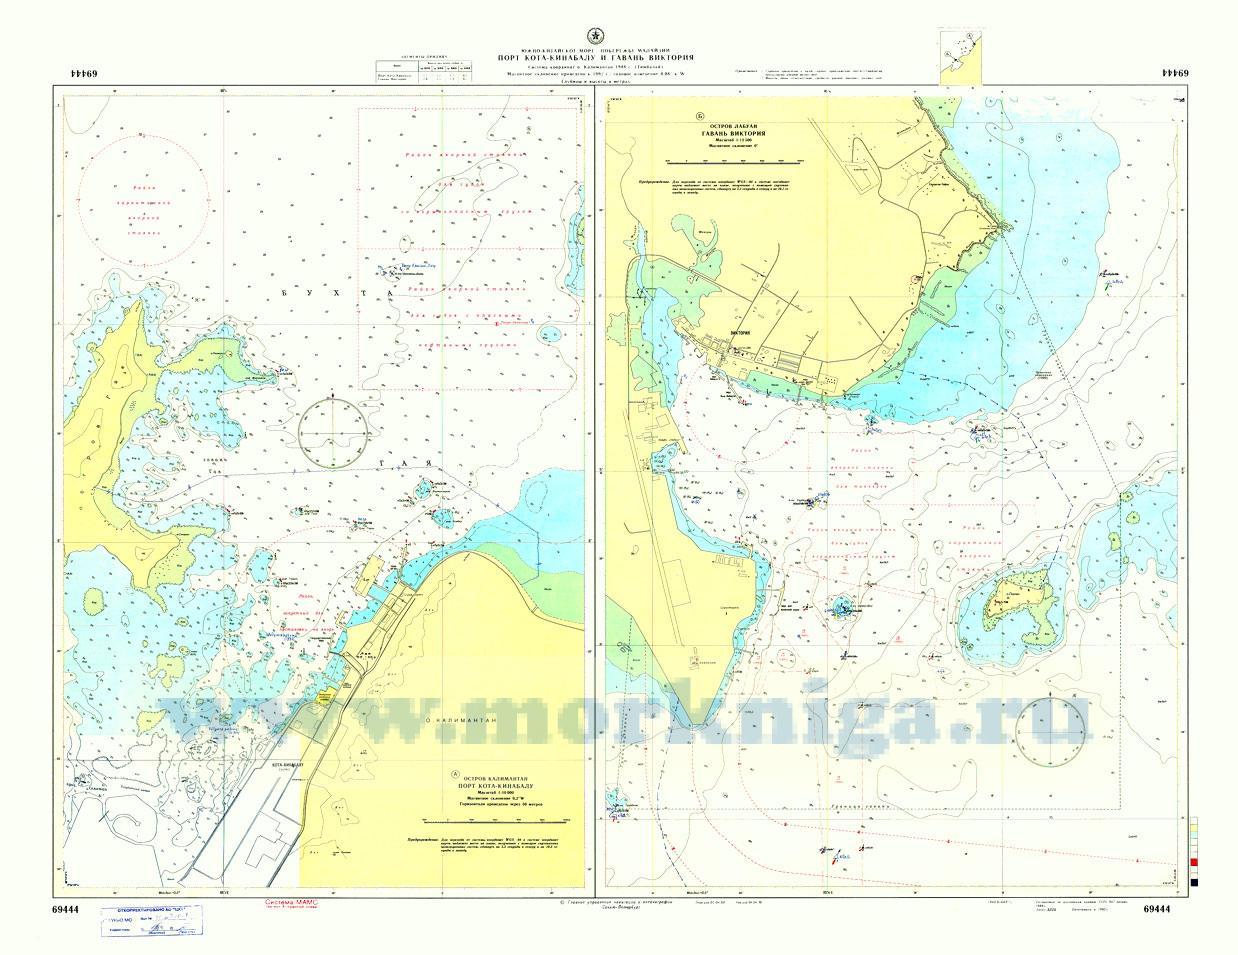 69444 Порт Кота-Кинабалу и гавань Виктория